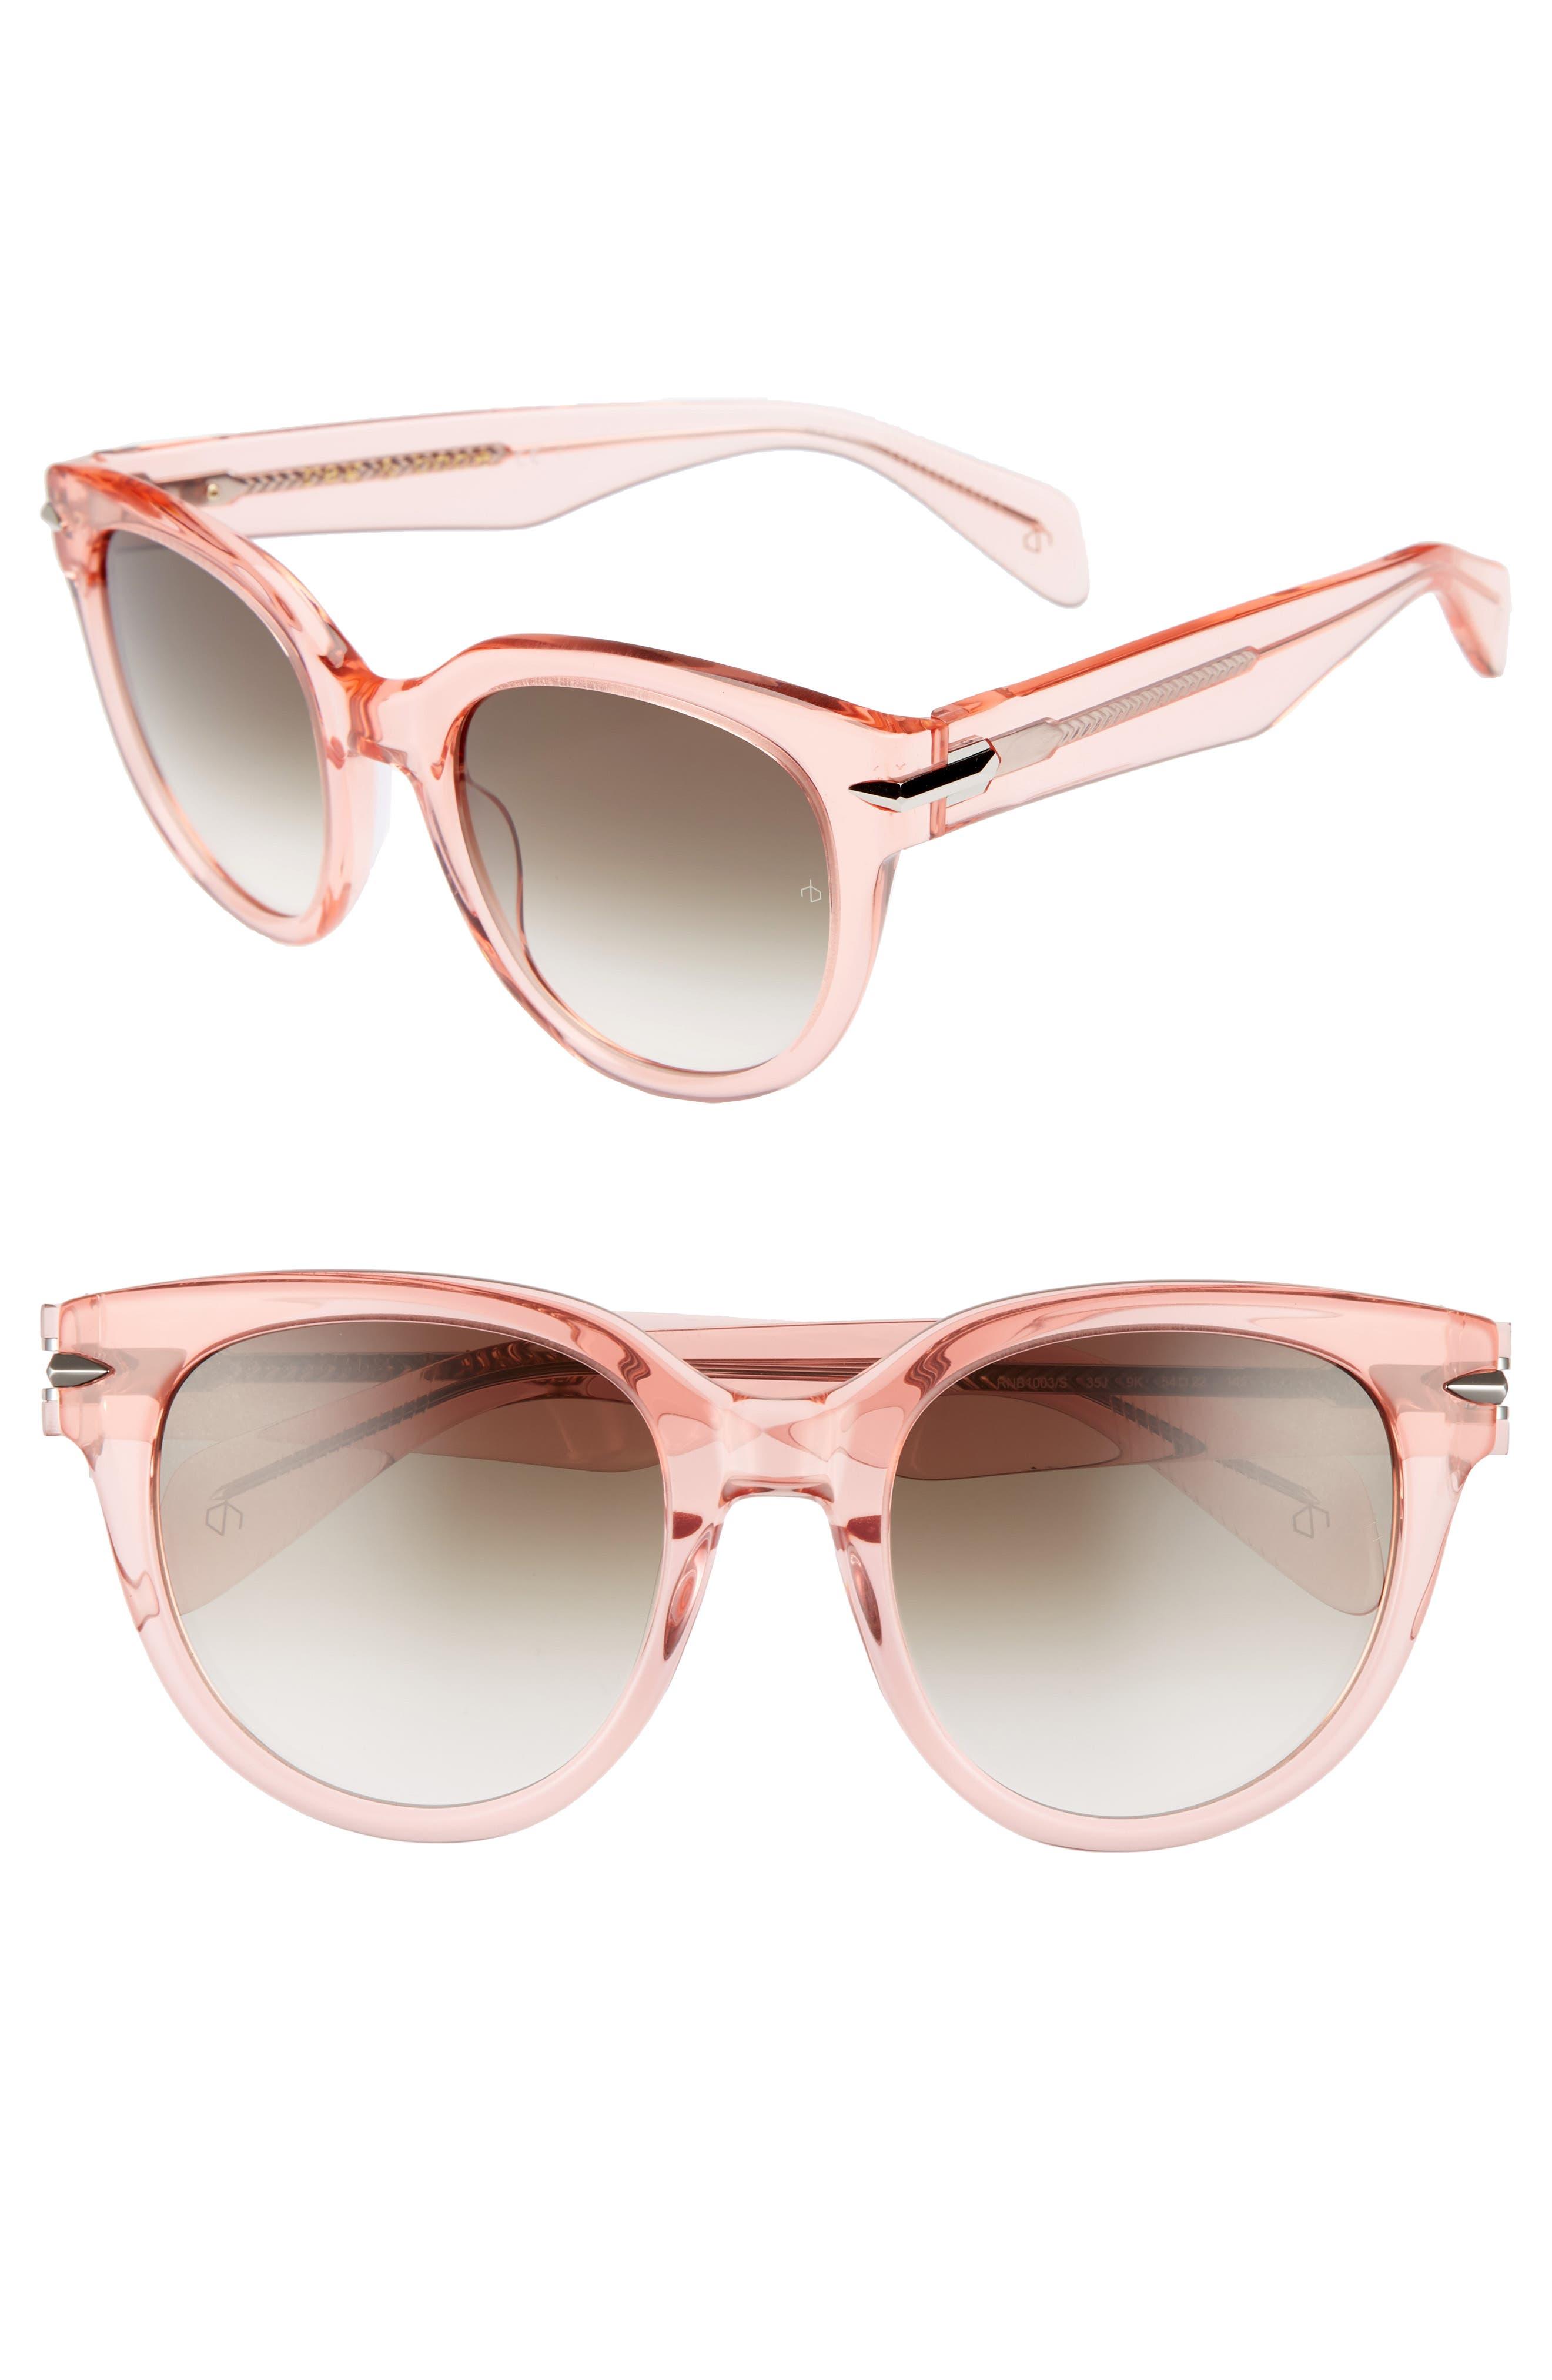 54mm Cat Eye Sunglasses,                         Main,                         color, PINK